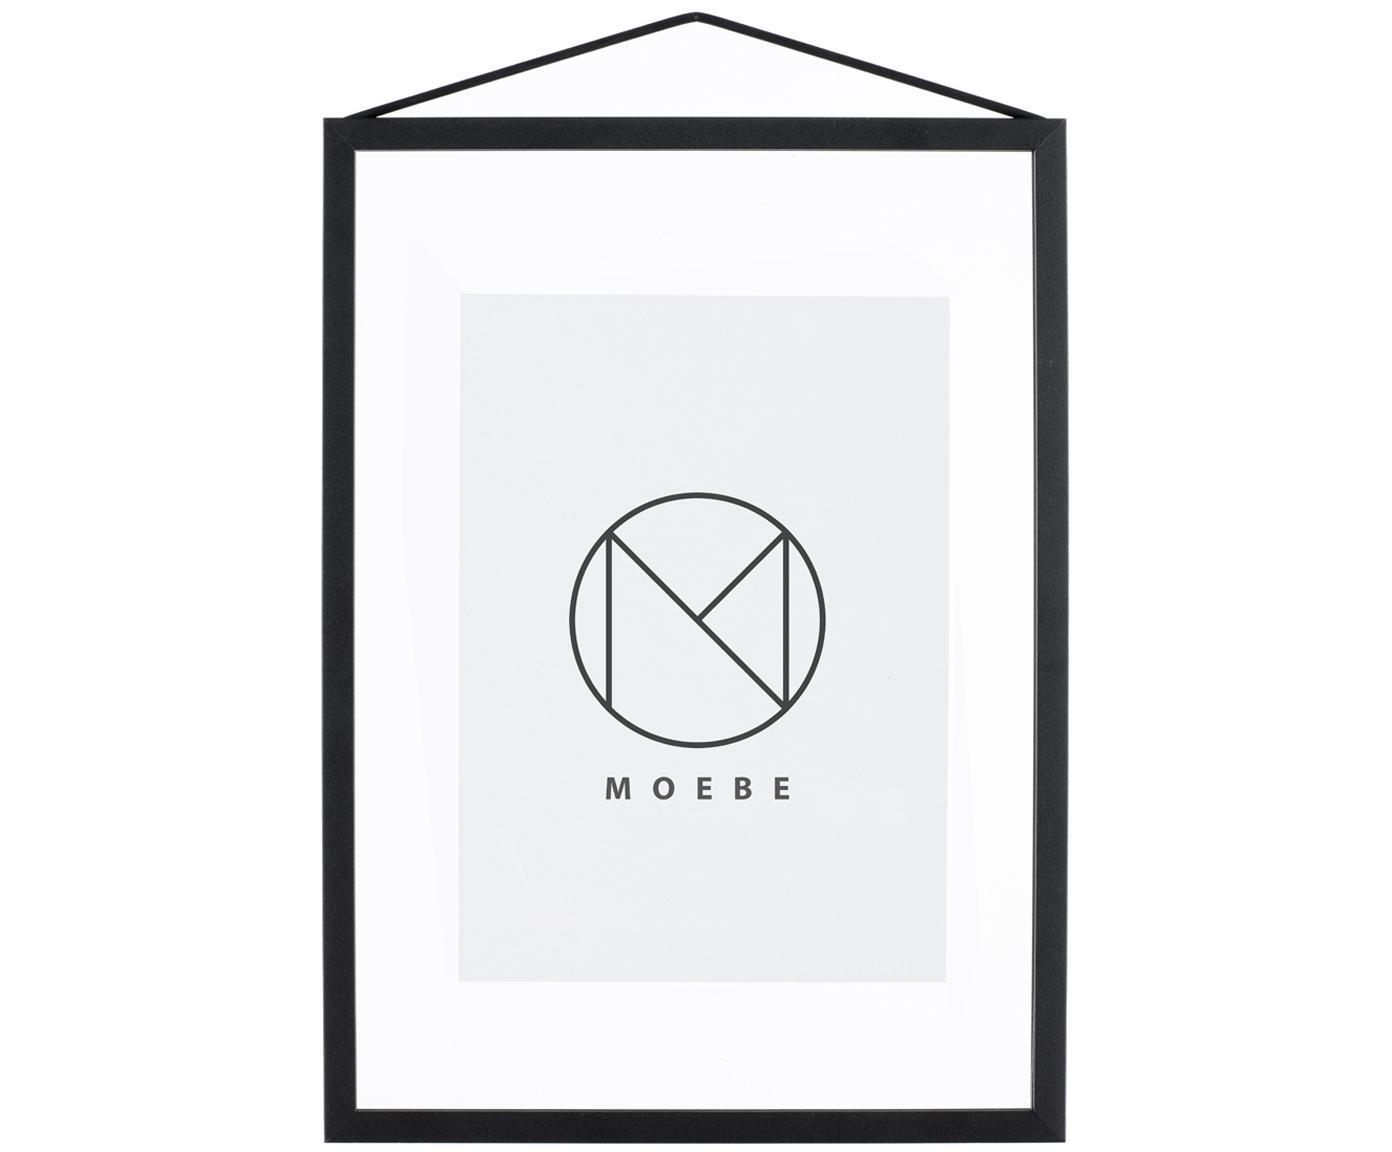 Marco Frame, Marco: negro Suspension: negro Cristal y parte trasera: transparente, An 23 x Al 31 cm